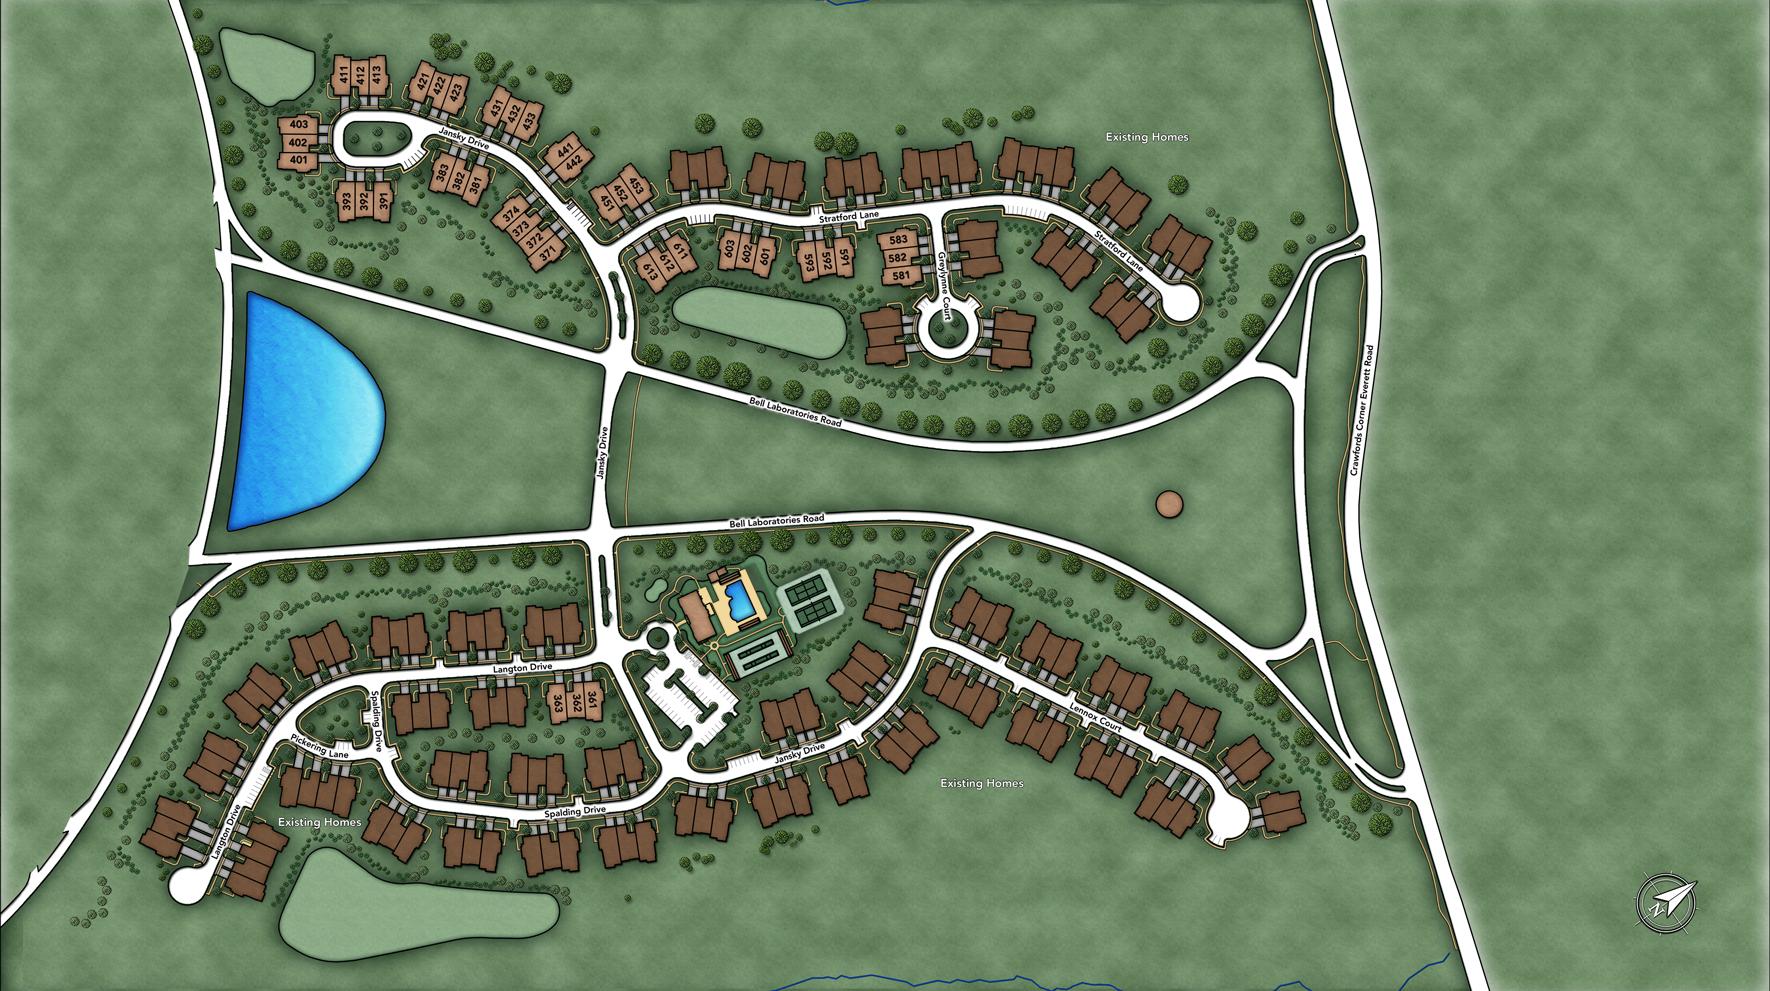 Regency at Holmdel Site Plan